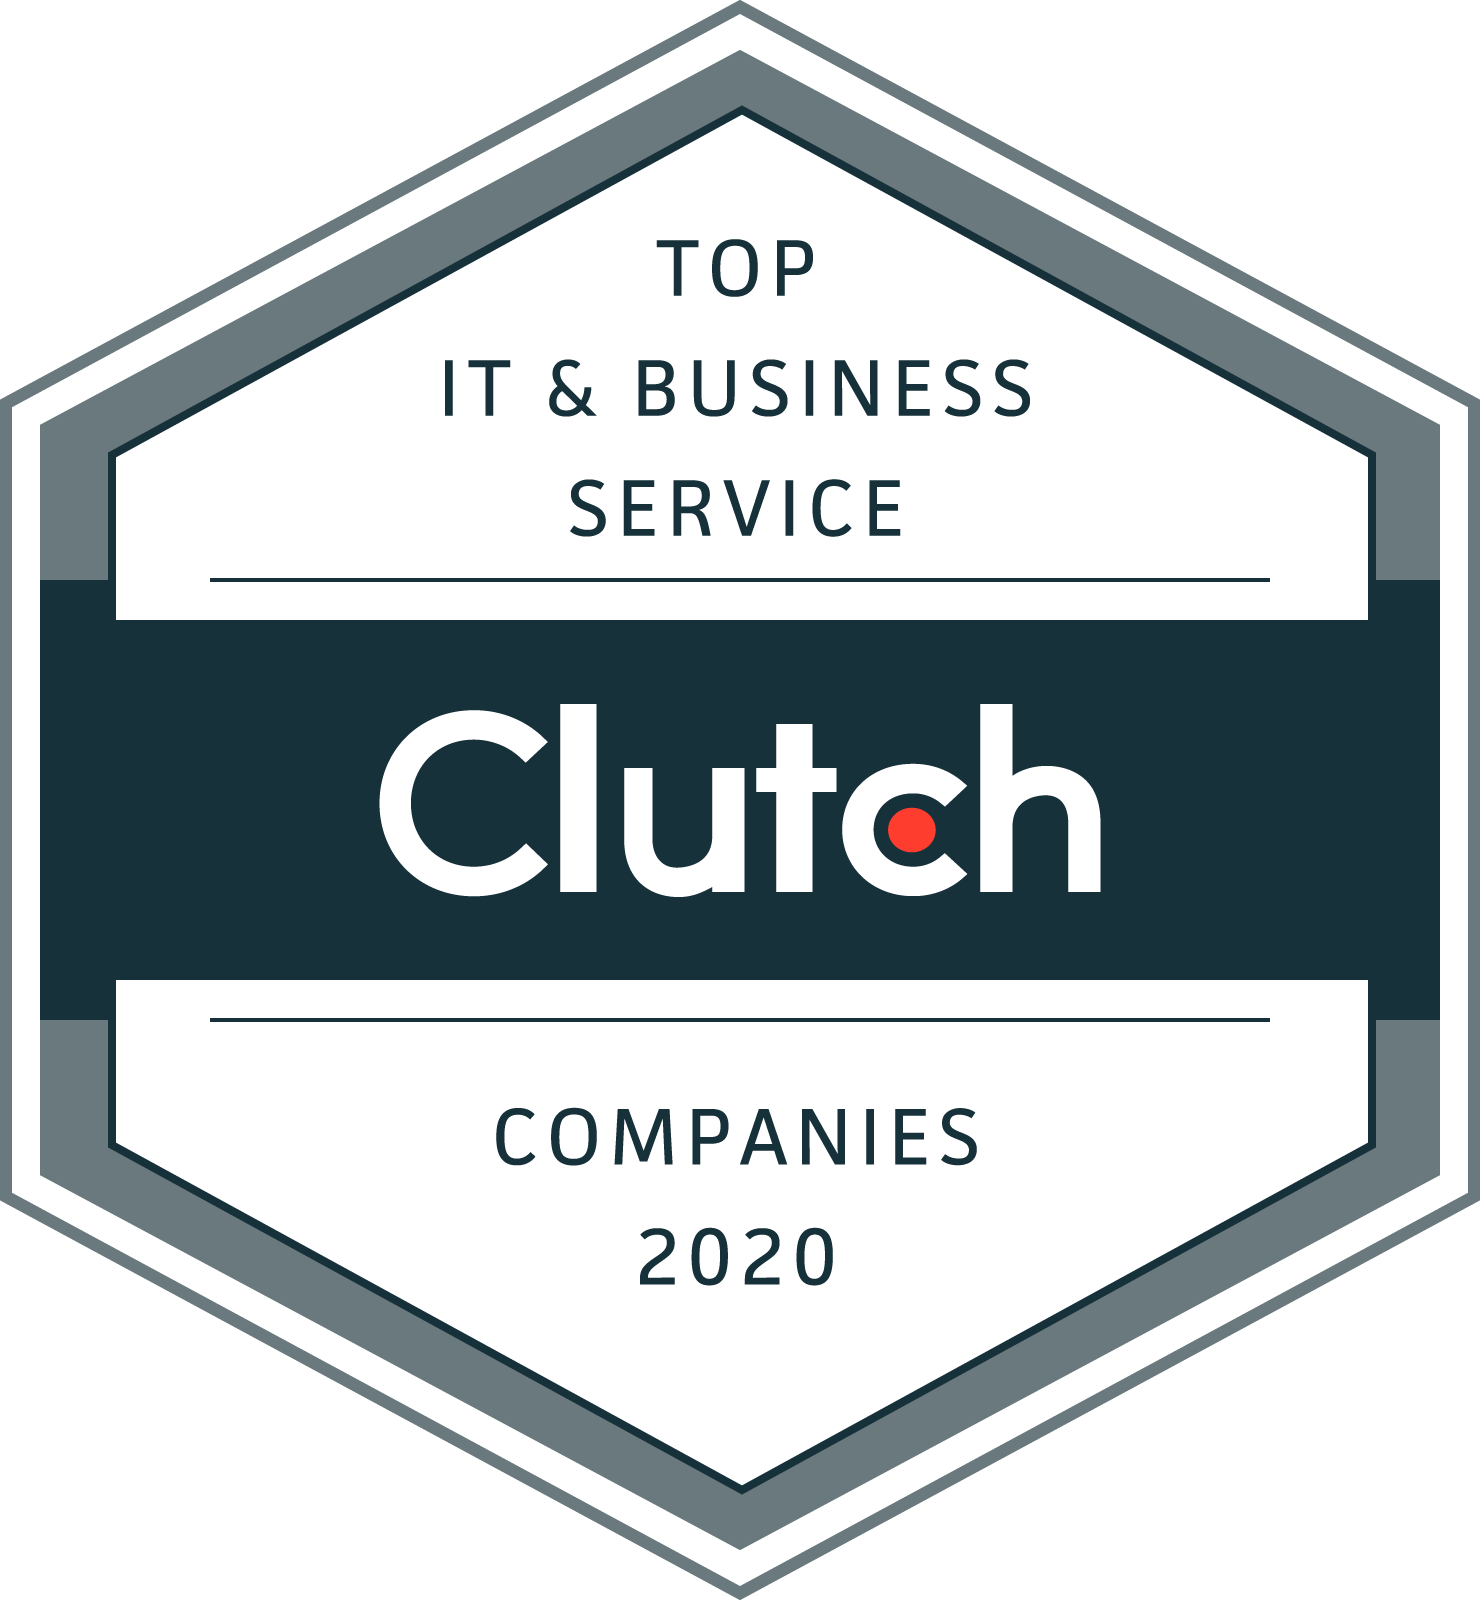 IT_Business_Service_Companies_2020-3